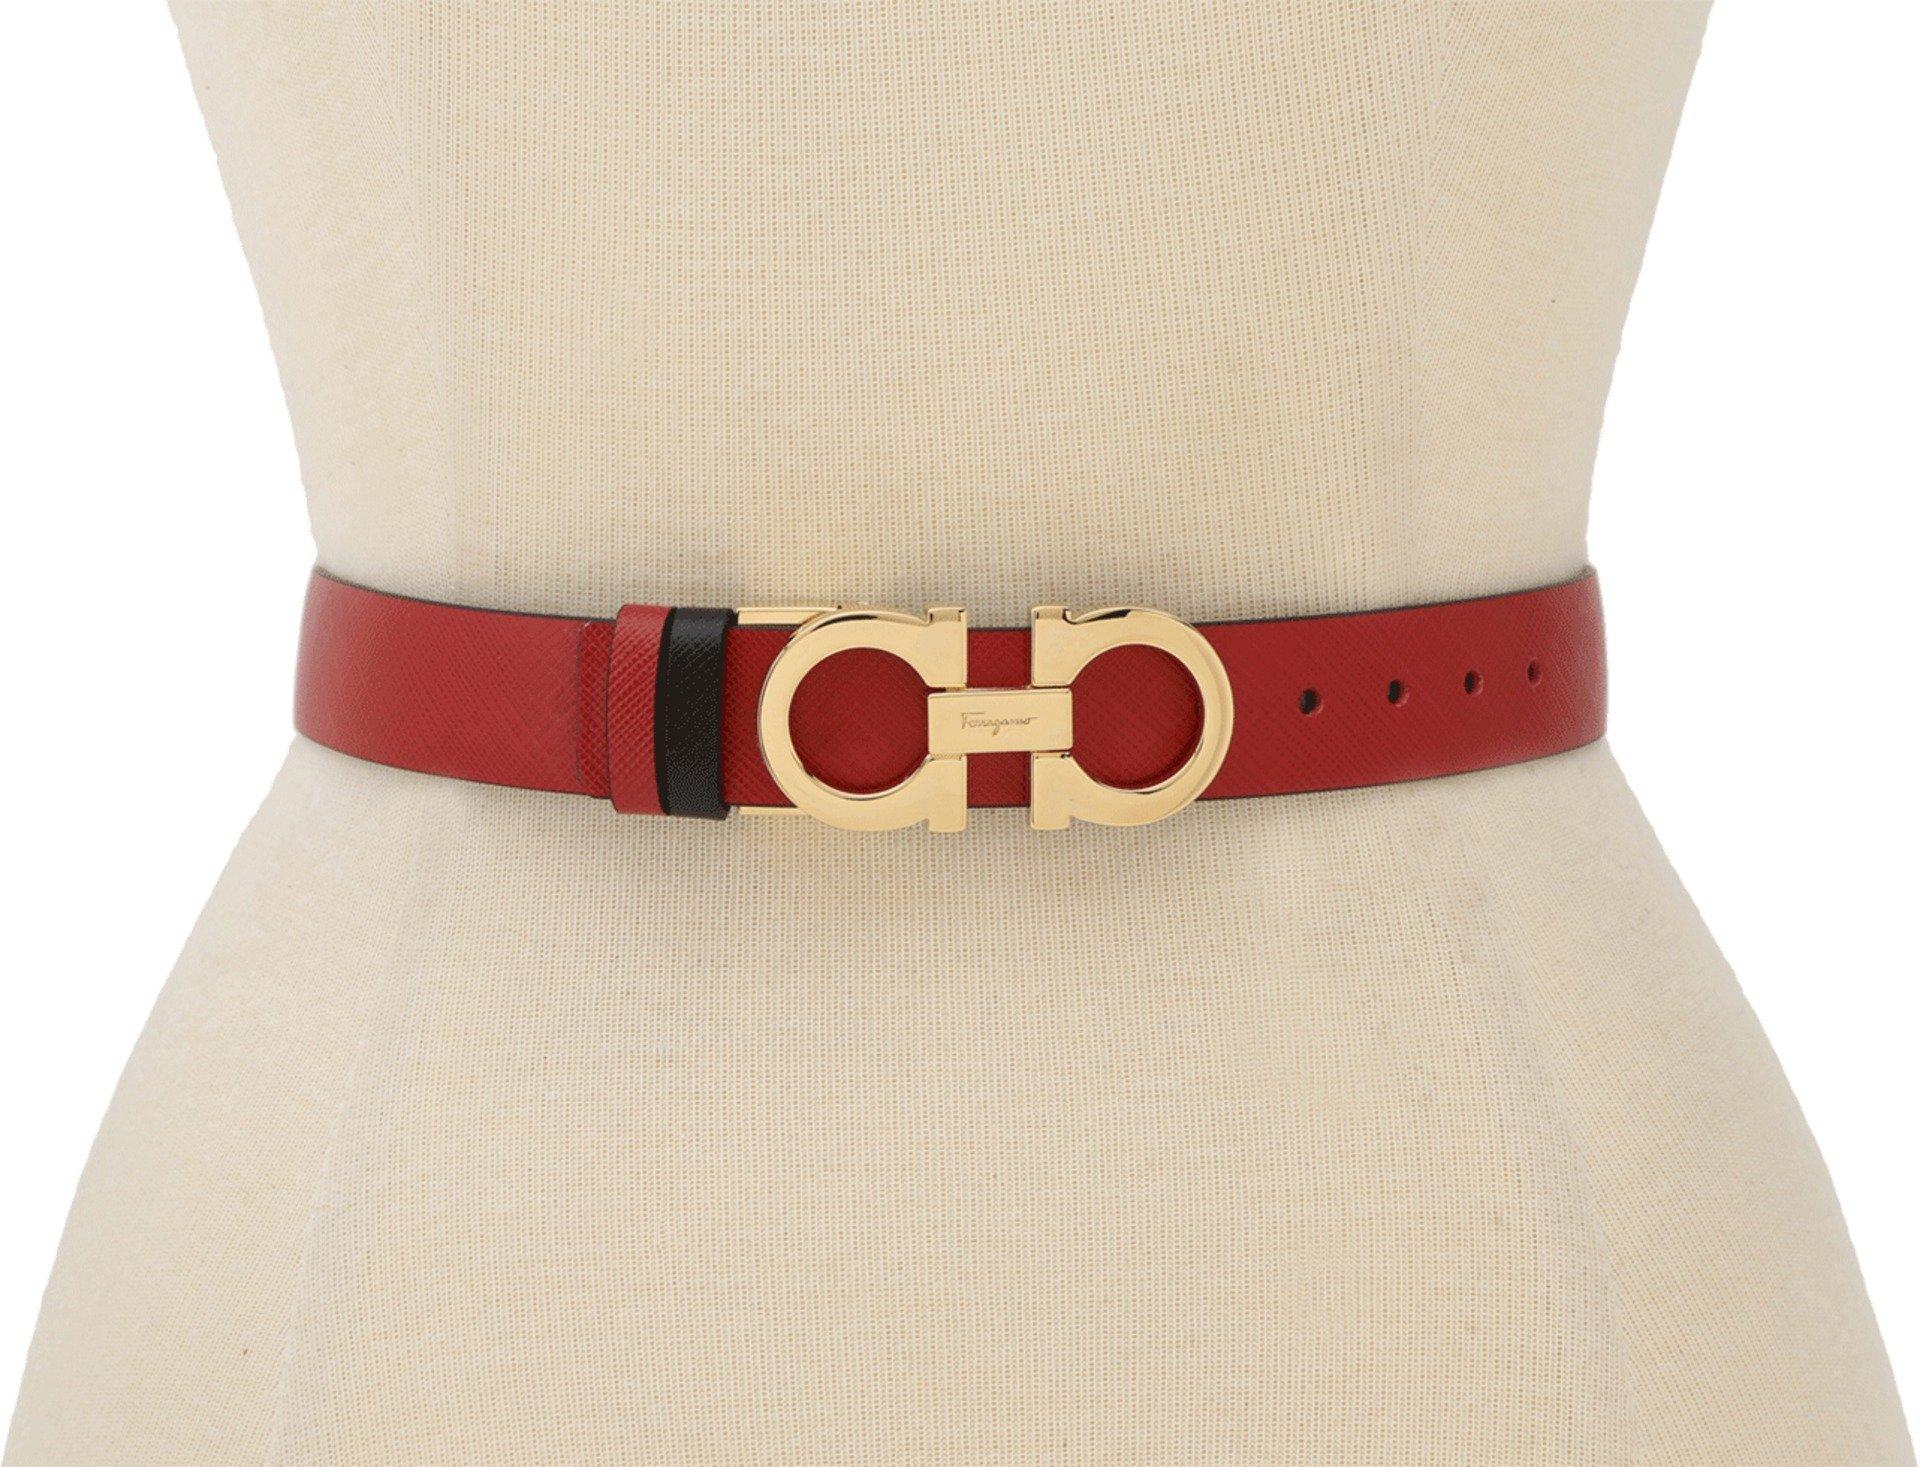 Salvatore Ferragamo Women's A565 Belt Rosso Tissu Belt 70 (28'' Waist) by Salvatore Ferragamo (Image #1)